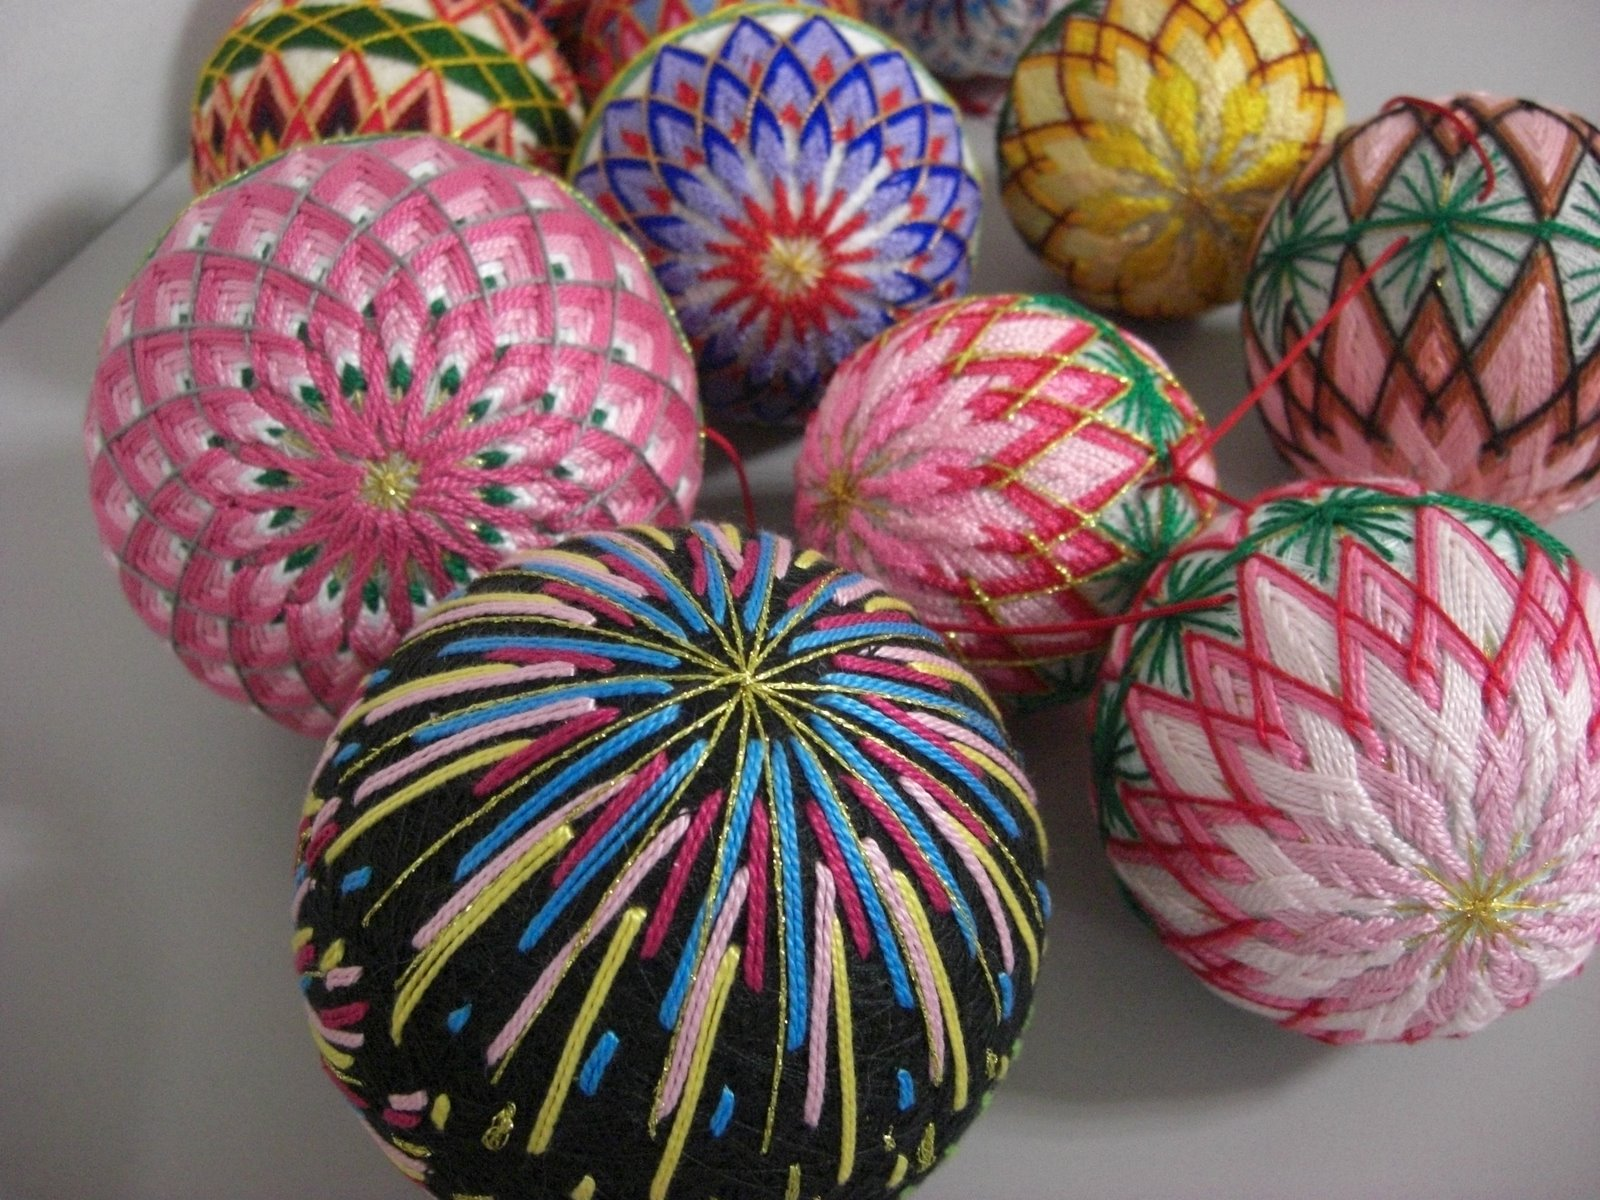 Manualizando bolas temari - Bolas de hilo ...